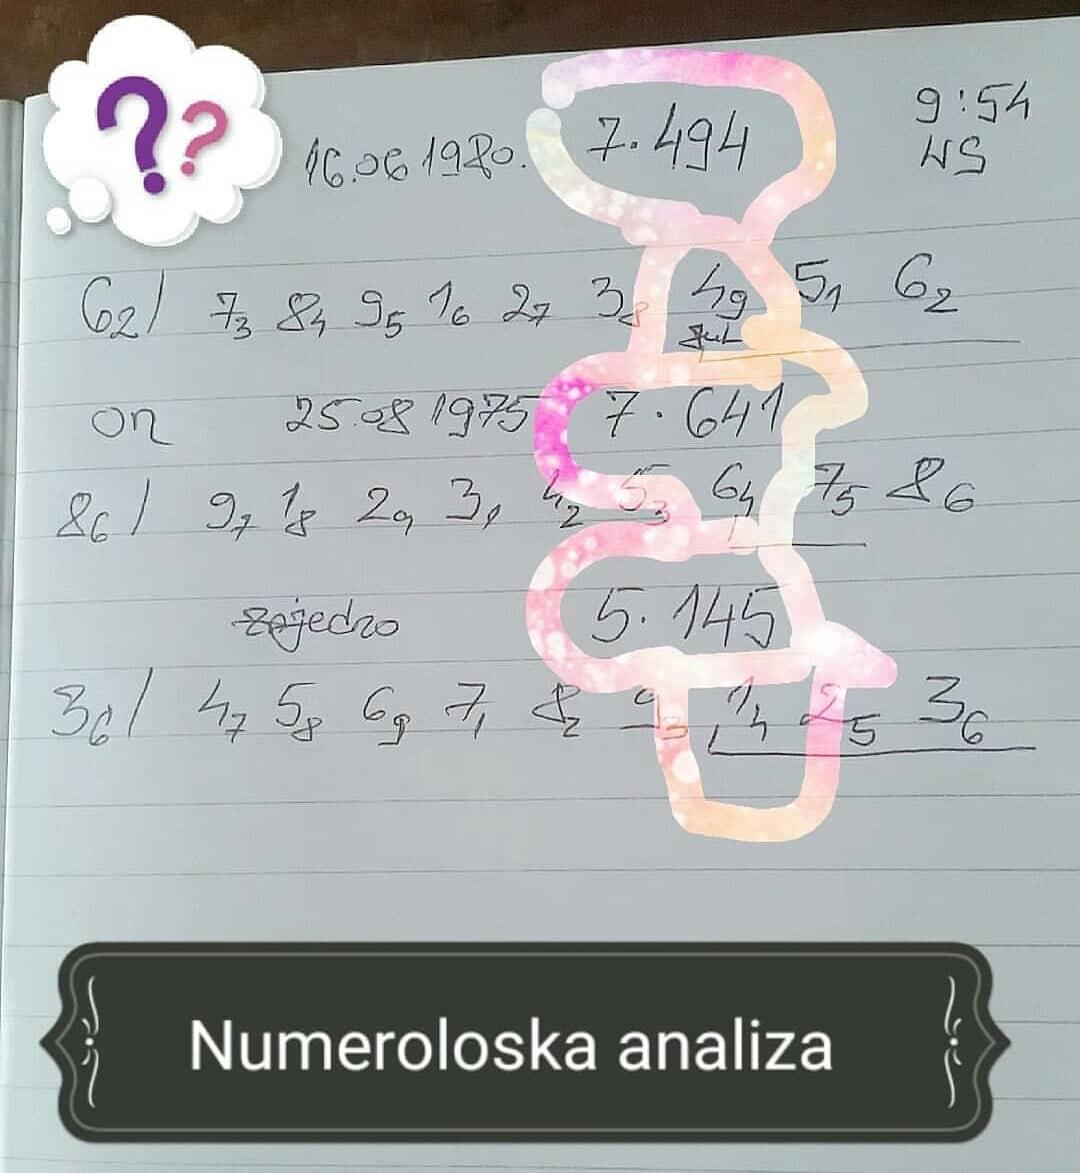 Numerološka analiza- Stella numerus